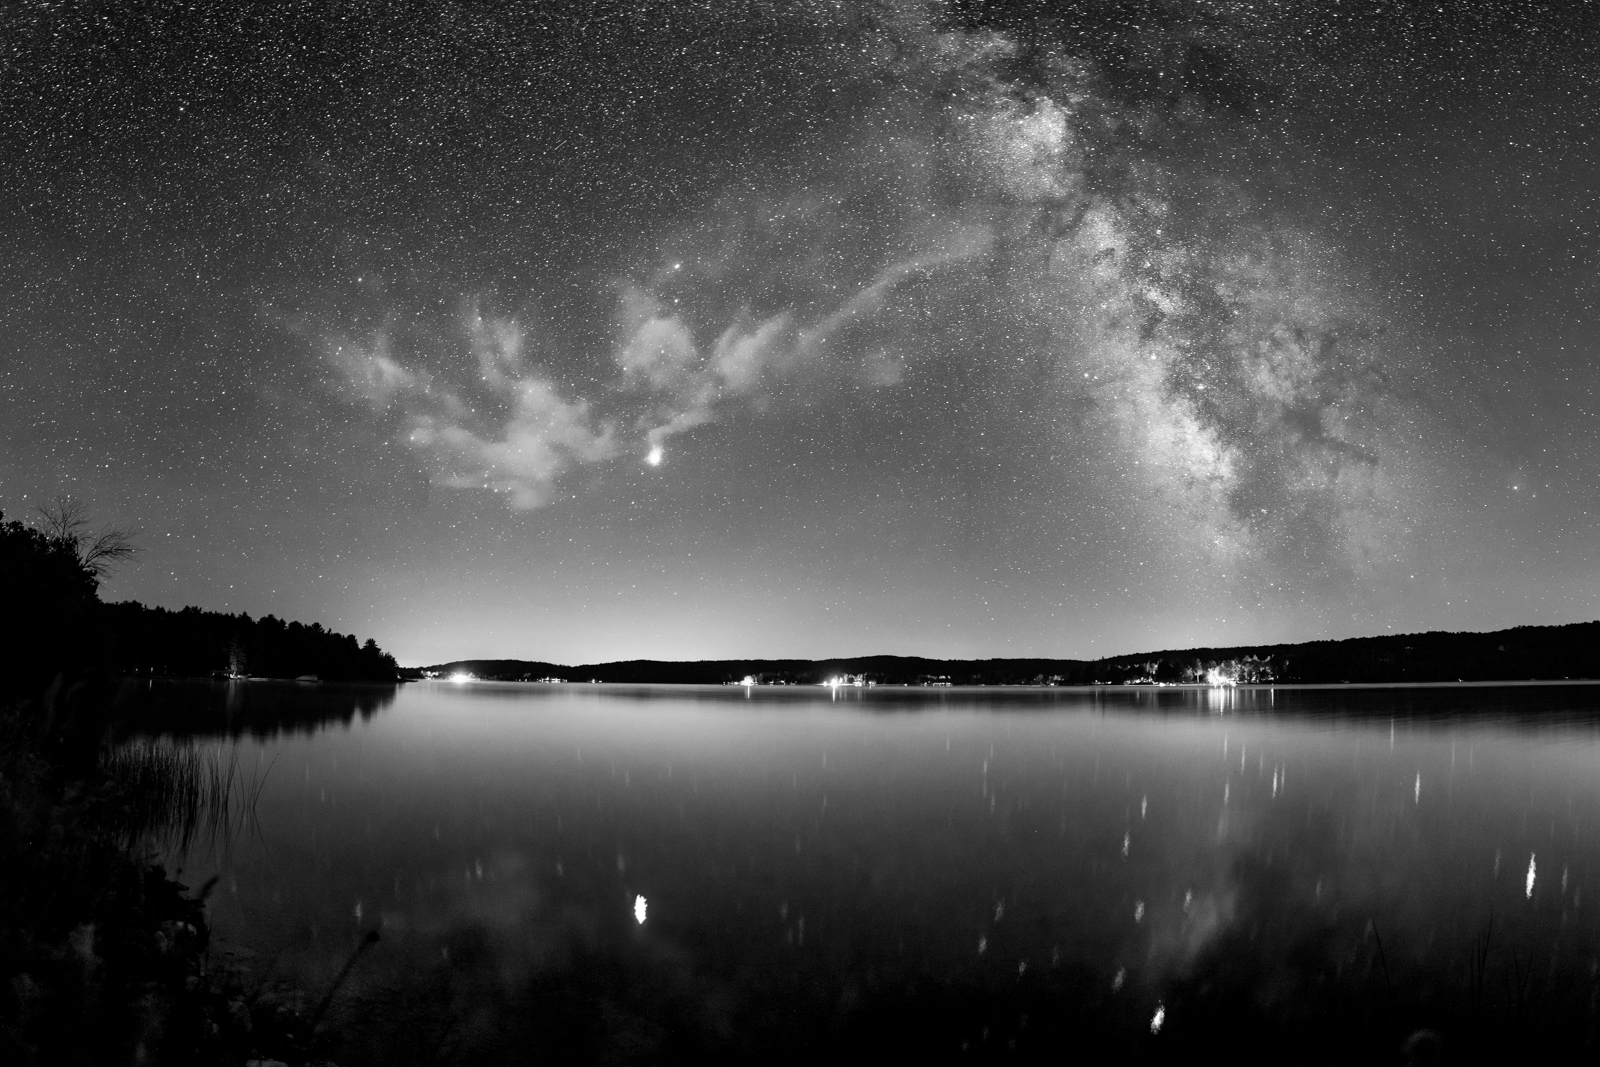 Central Lake, Michigan